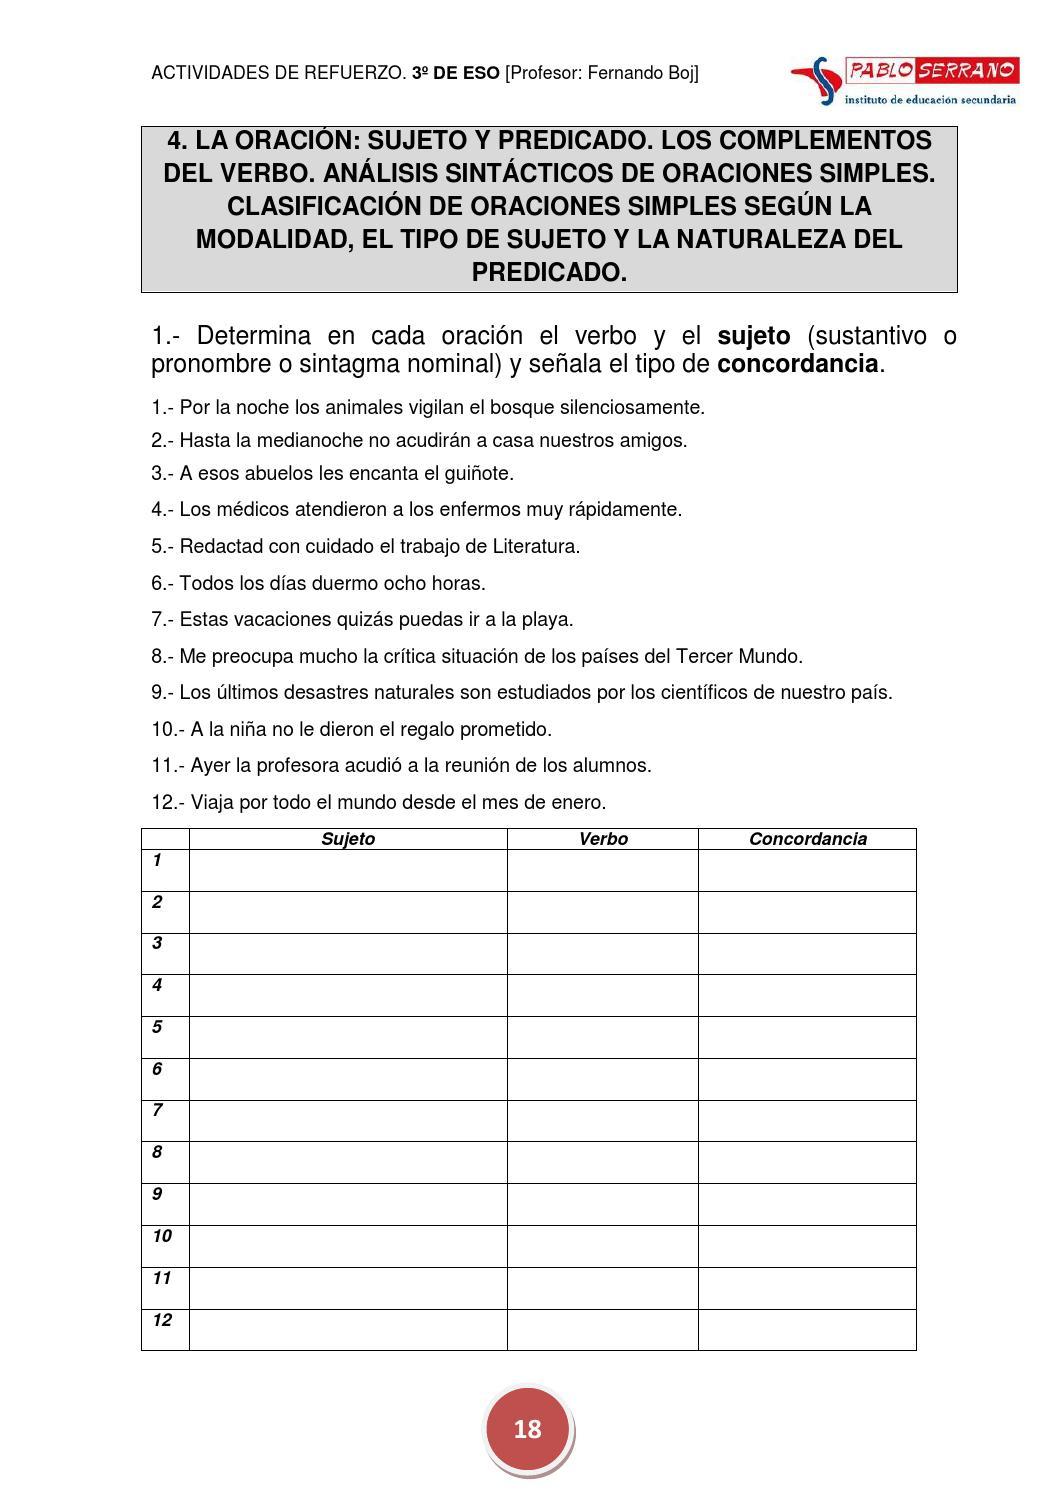 52c0cbdeb0ad Actividades de refuerzo de LENGUA CASTELLANA Y LITERATURA. 3º DE ESO by  Fernando Boj - issuu